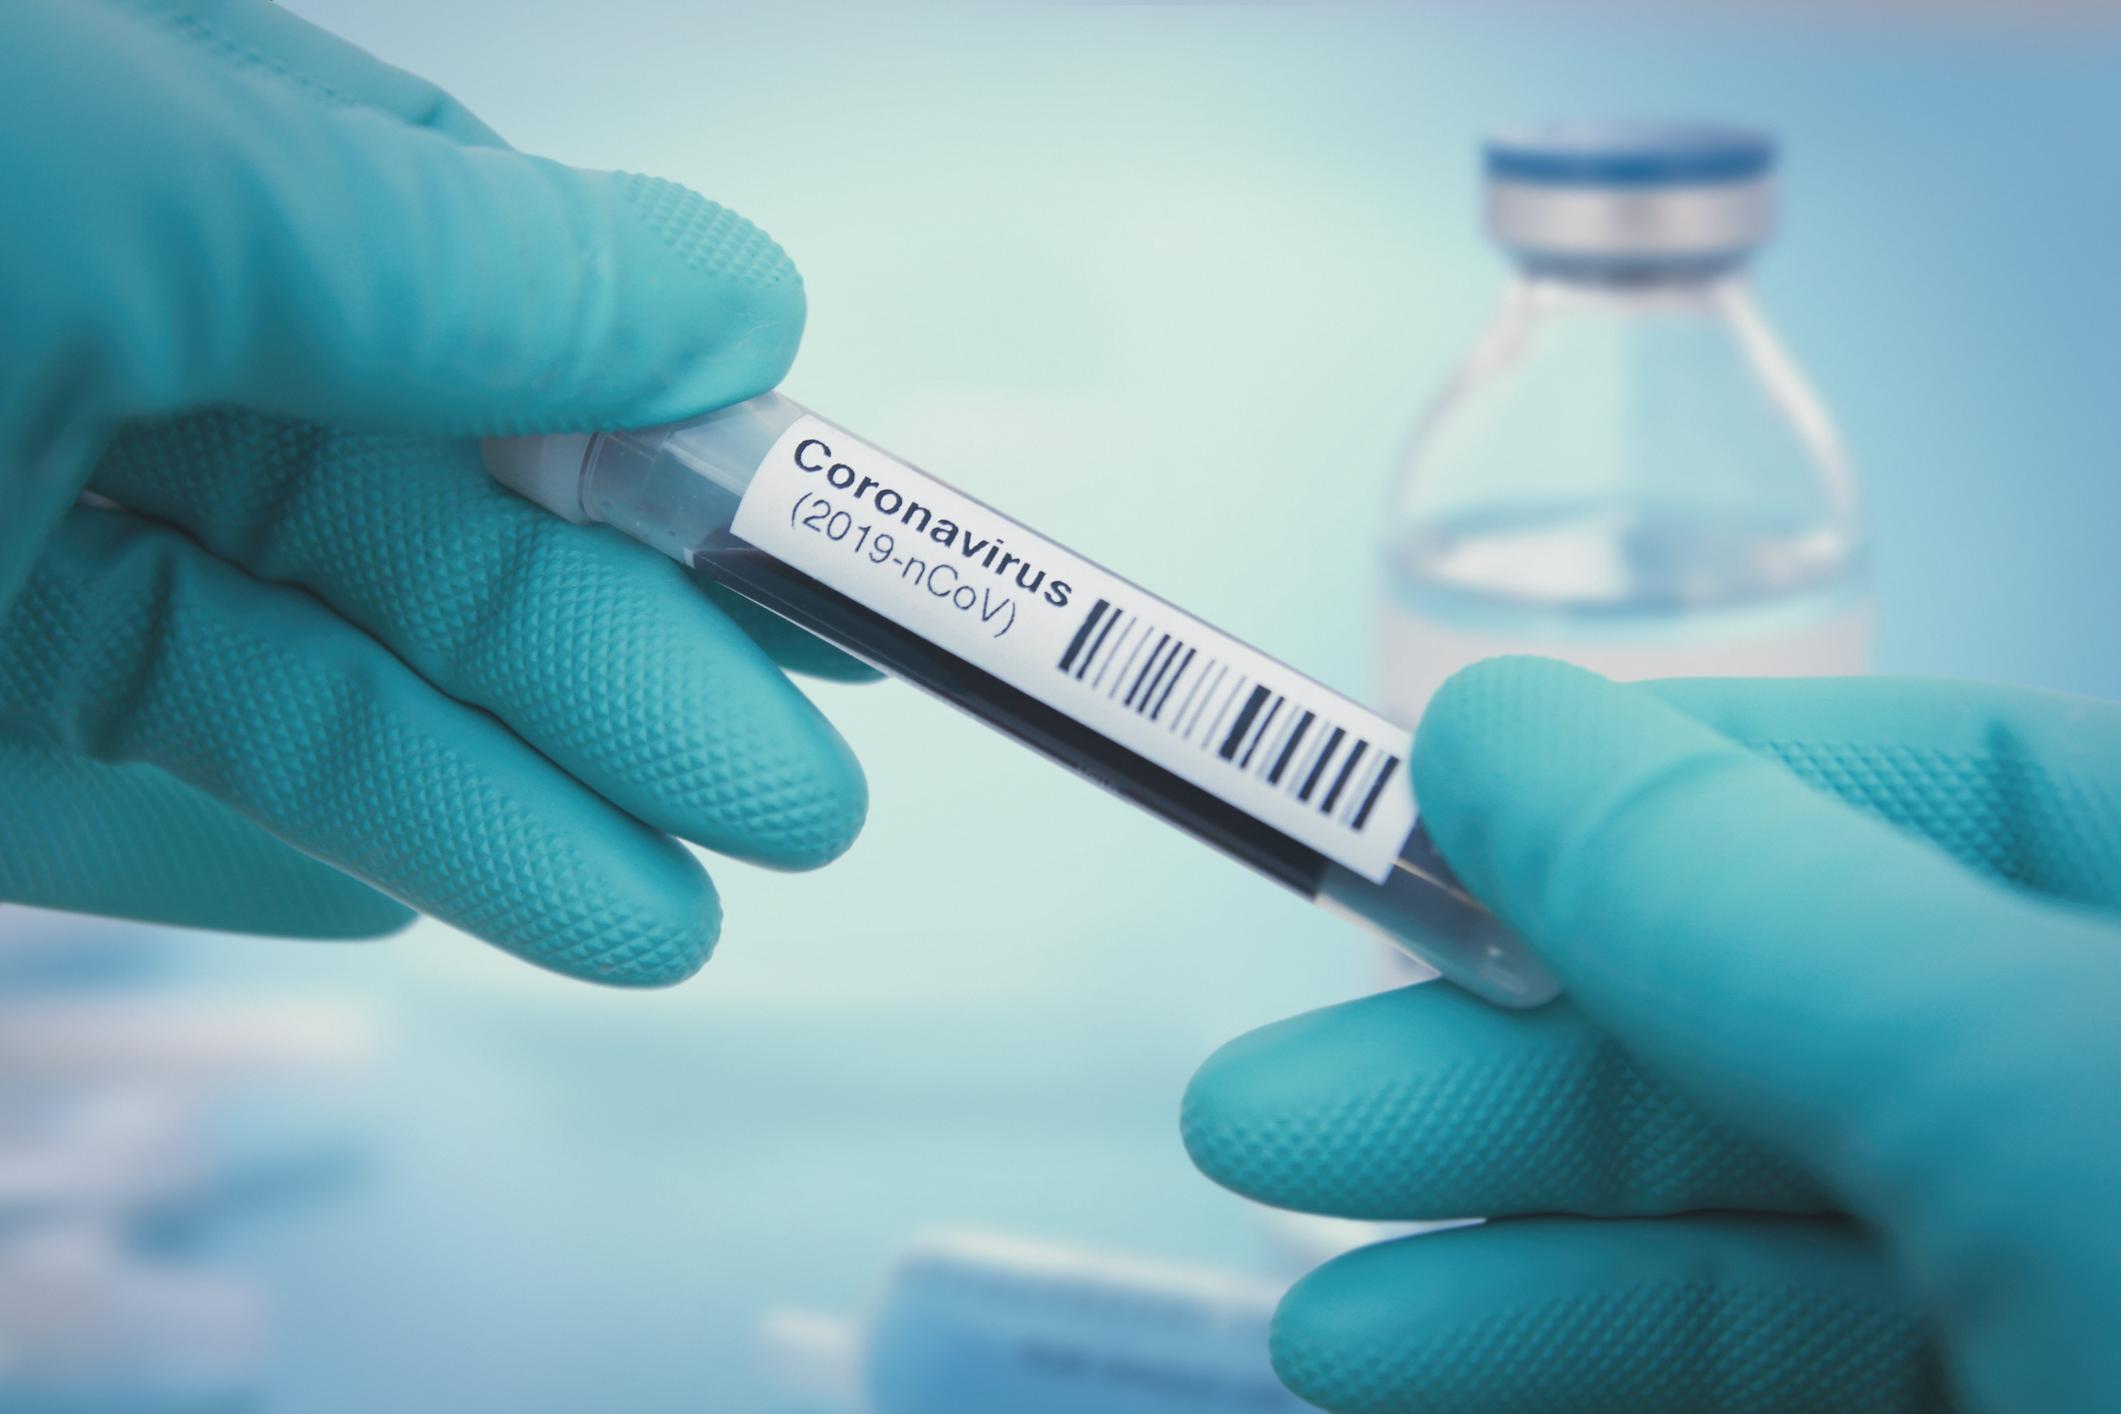 Swinburne University confirms COVID-19 case